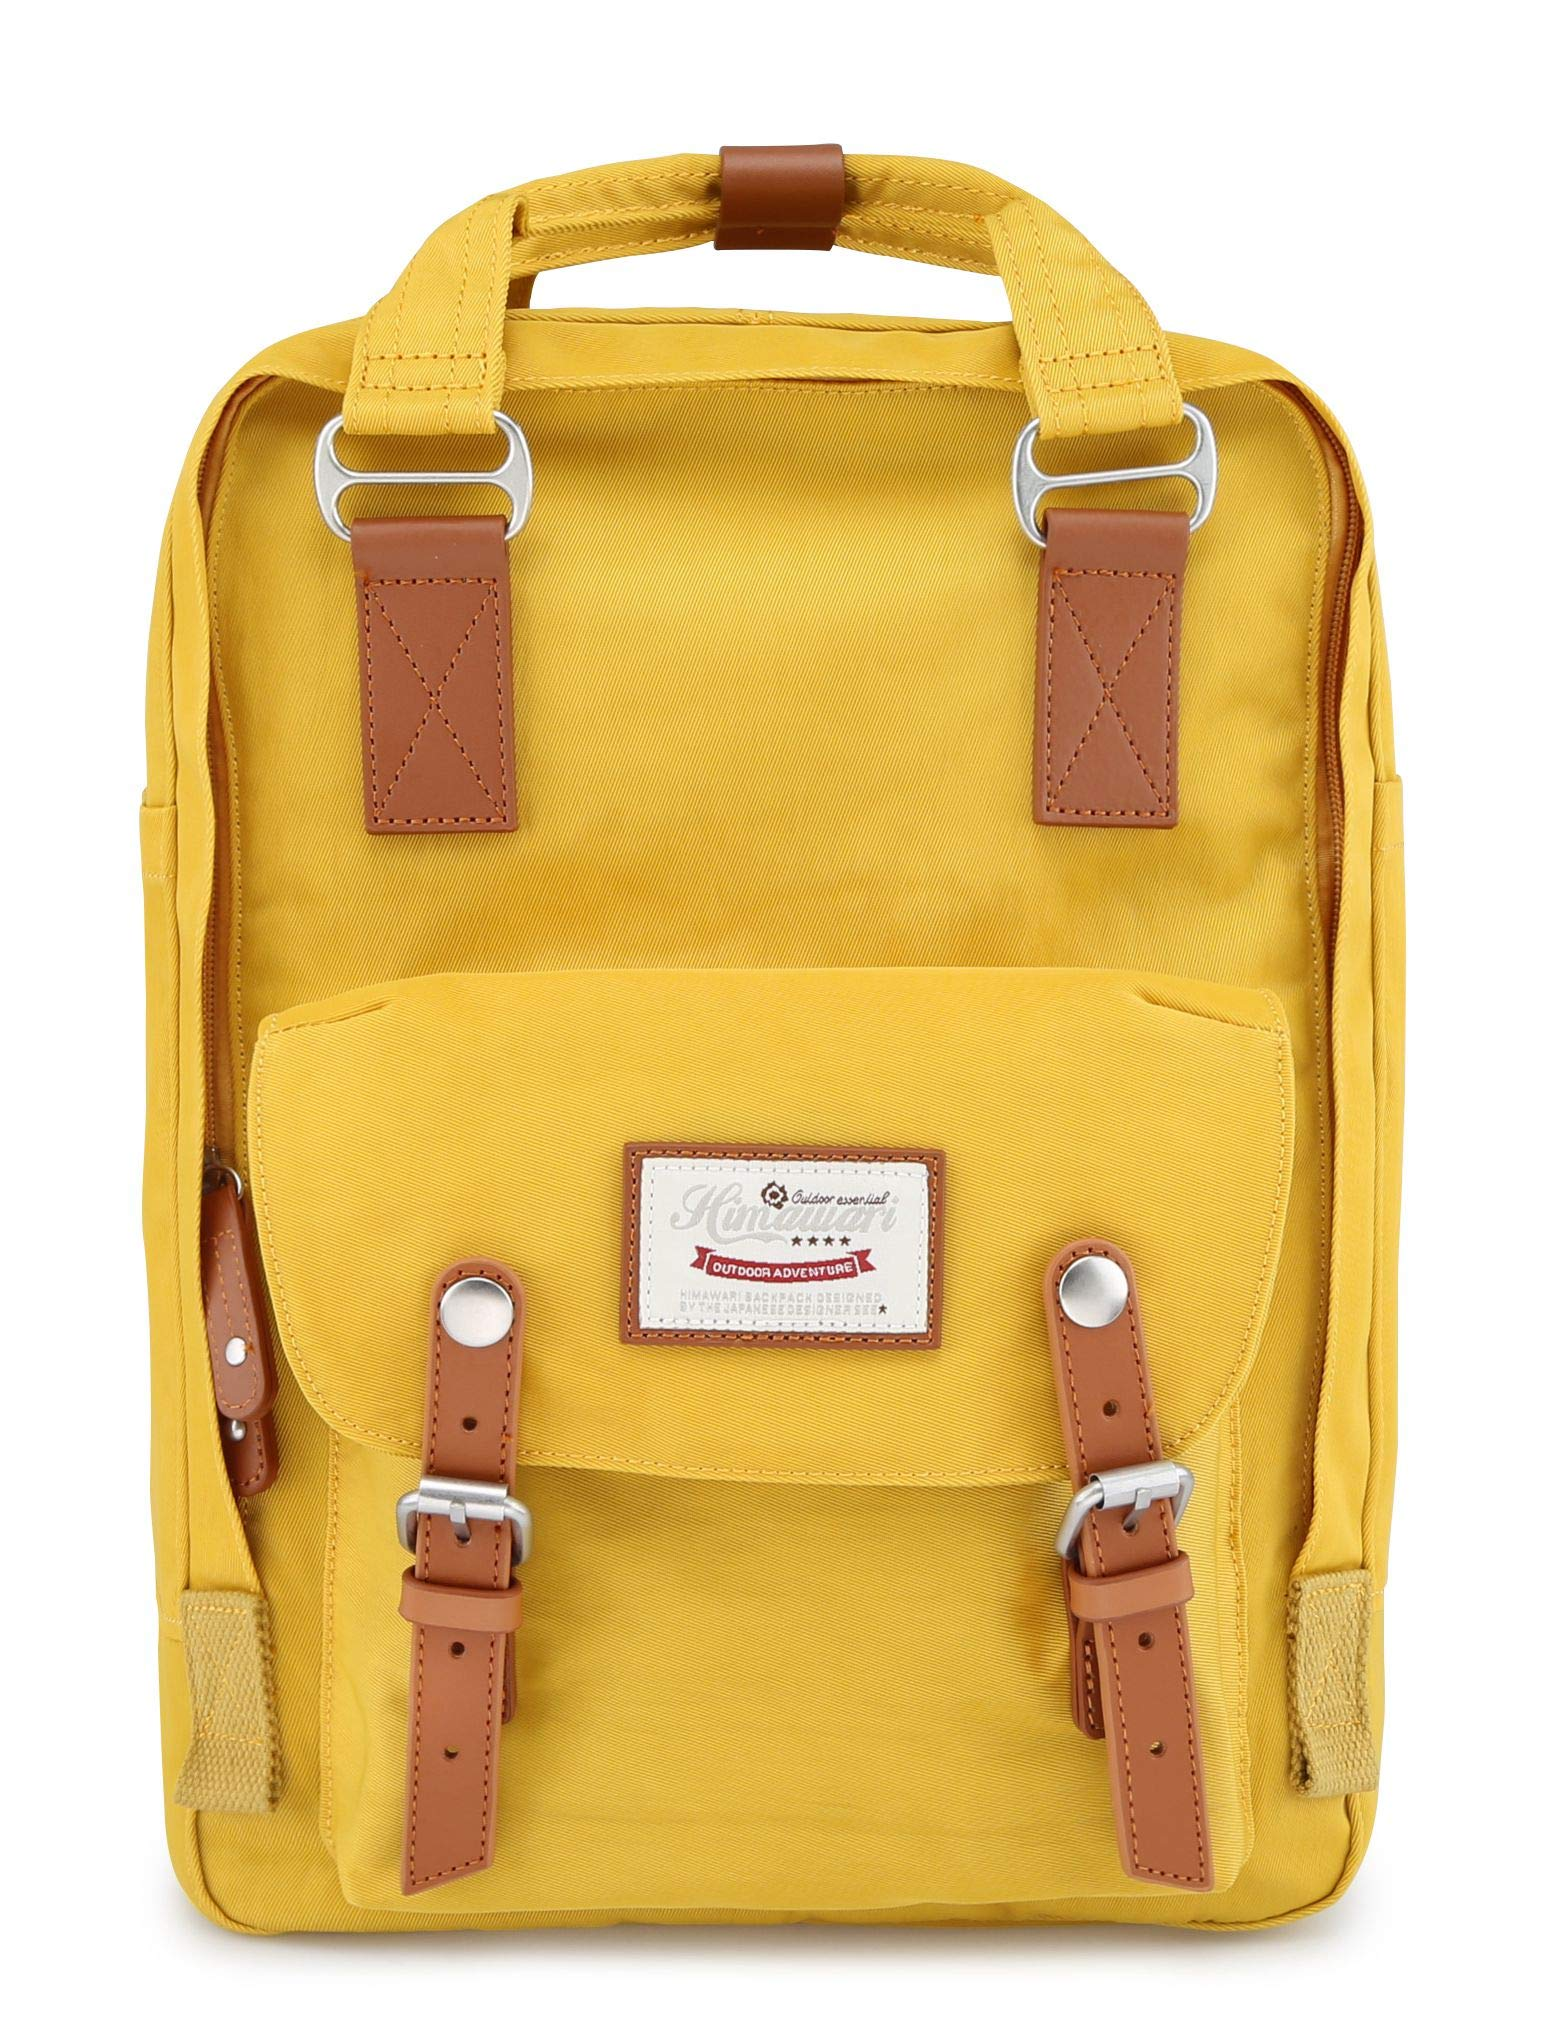 himawari 15 Inch School Travel Backpack for Women Men Waterproof 14 inch Laptop Compartment Bag for College (HIM-49#) by himawari